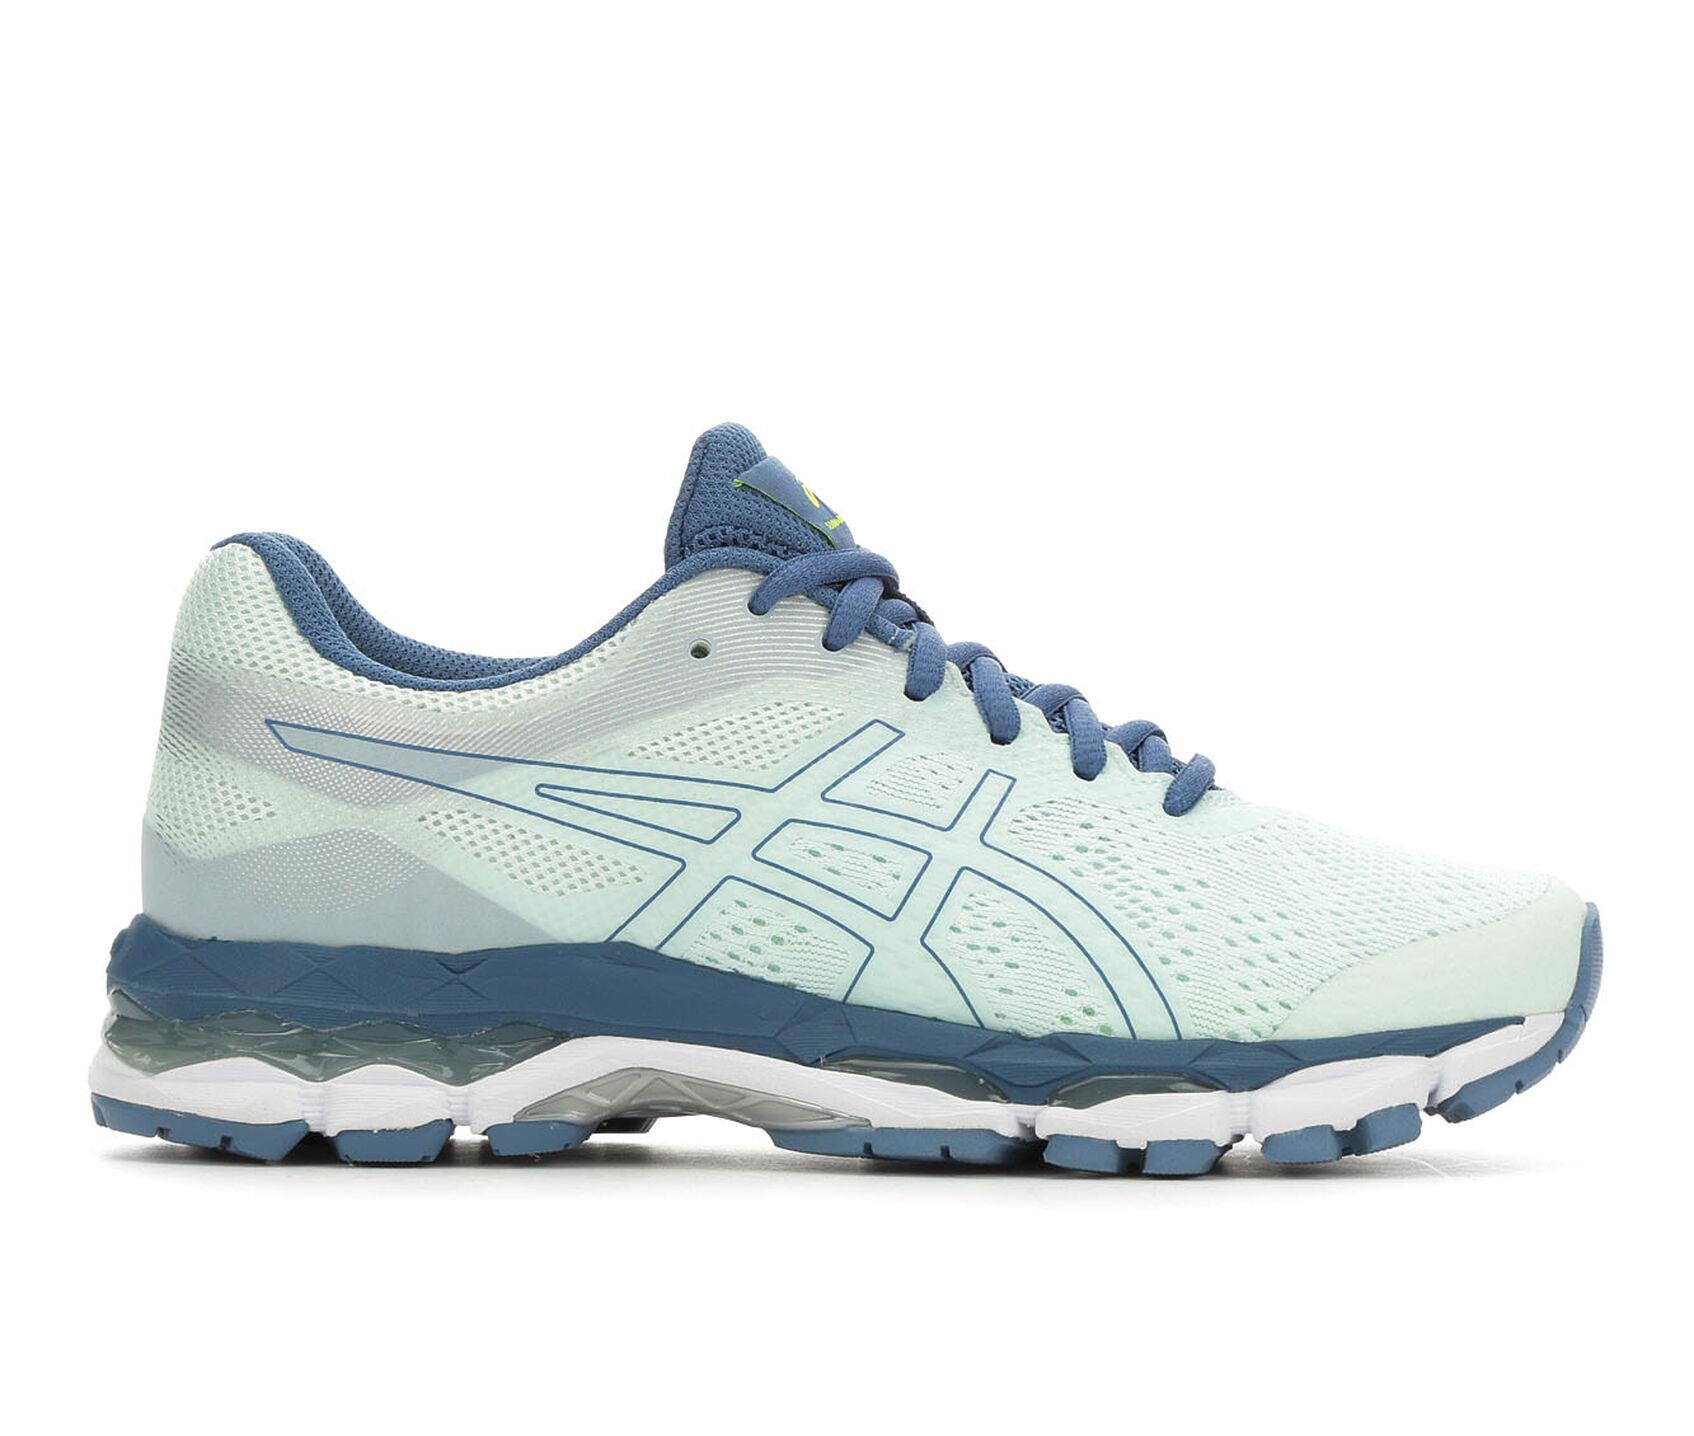 3fad72906cbb95 Women's ASICS Gel Superion 2 Running Shoes | Shoe Carnival